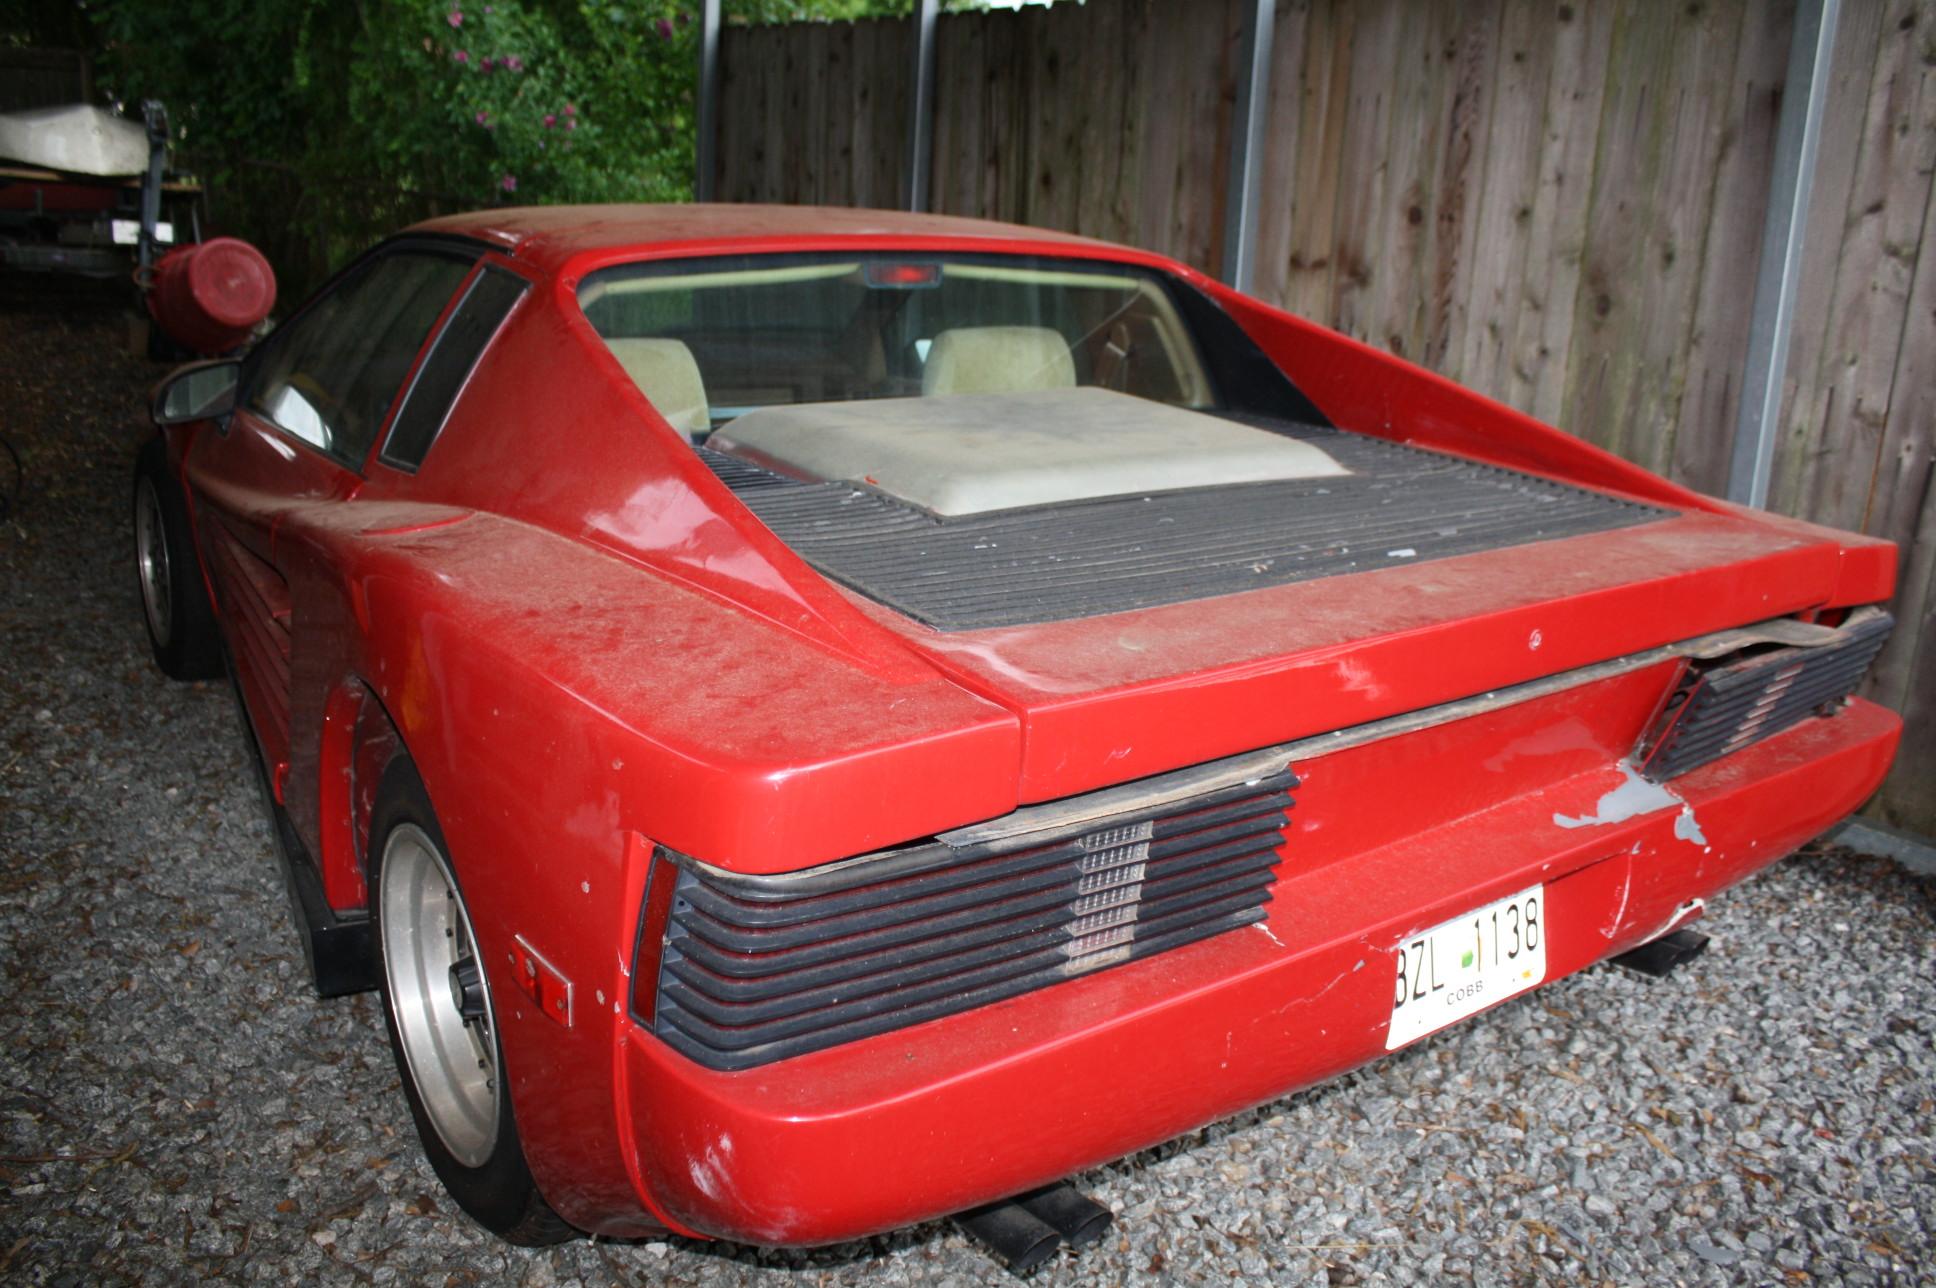 1988 Pontiac Fiero With Ferrari Kit Appraisal Engine Inc